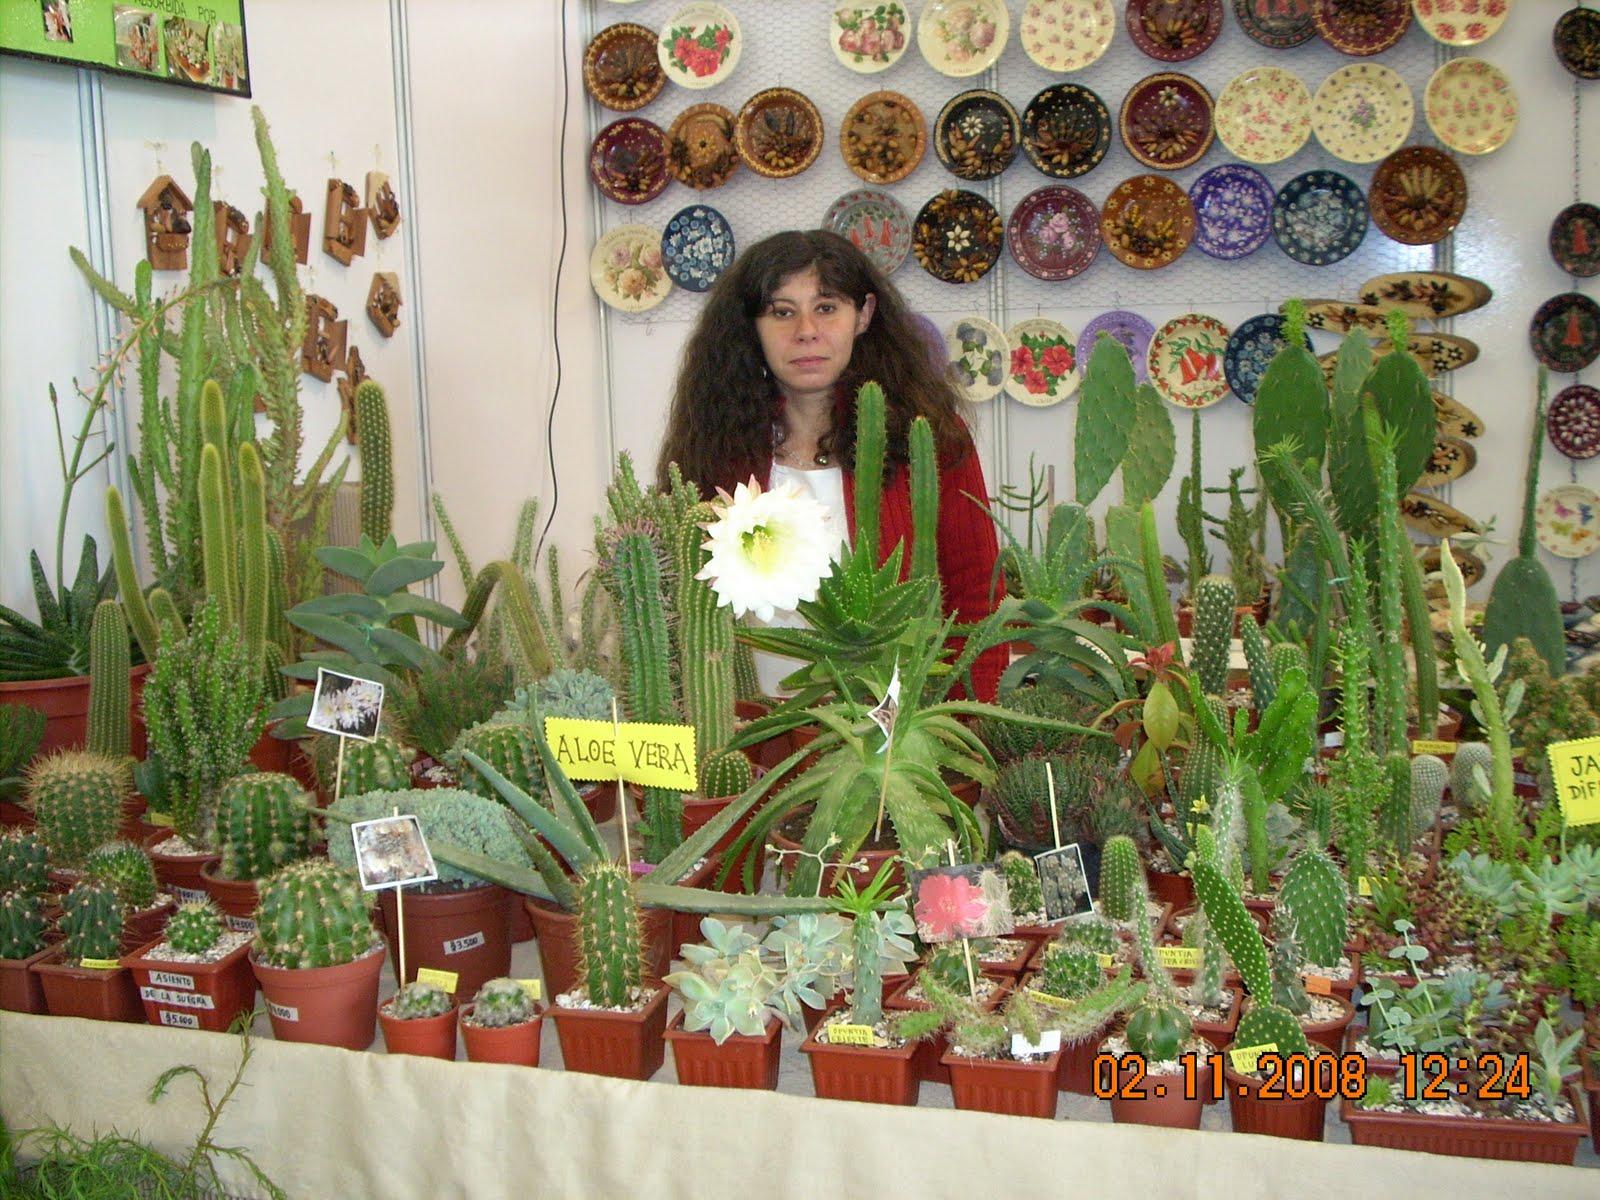 Vivero sanssouci feria expo primavera for Viveros en temuco